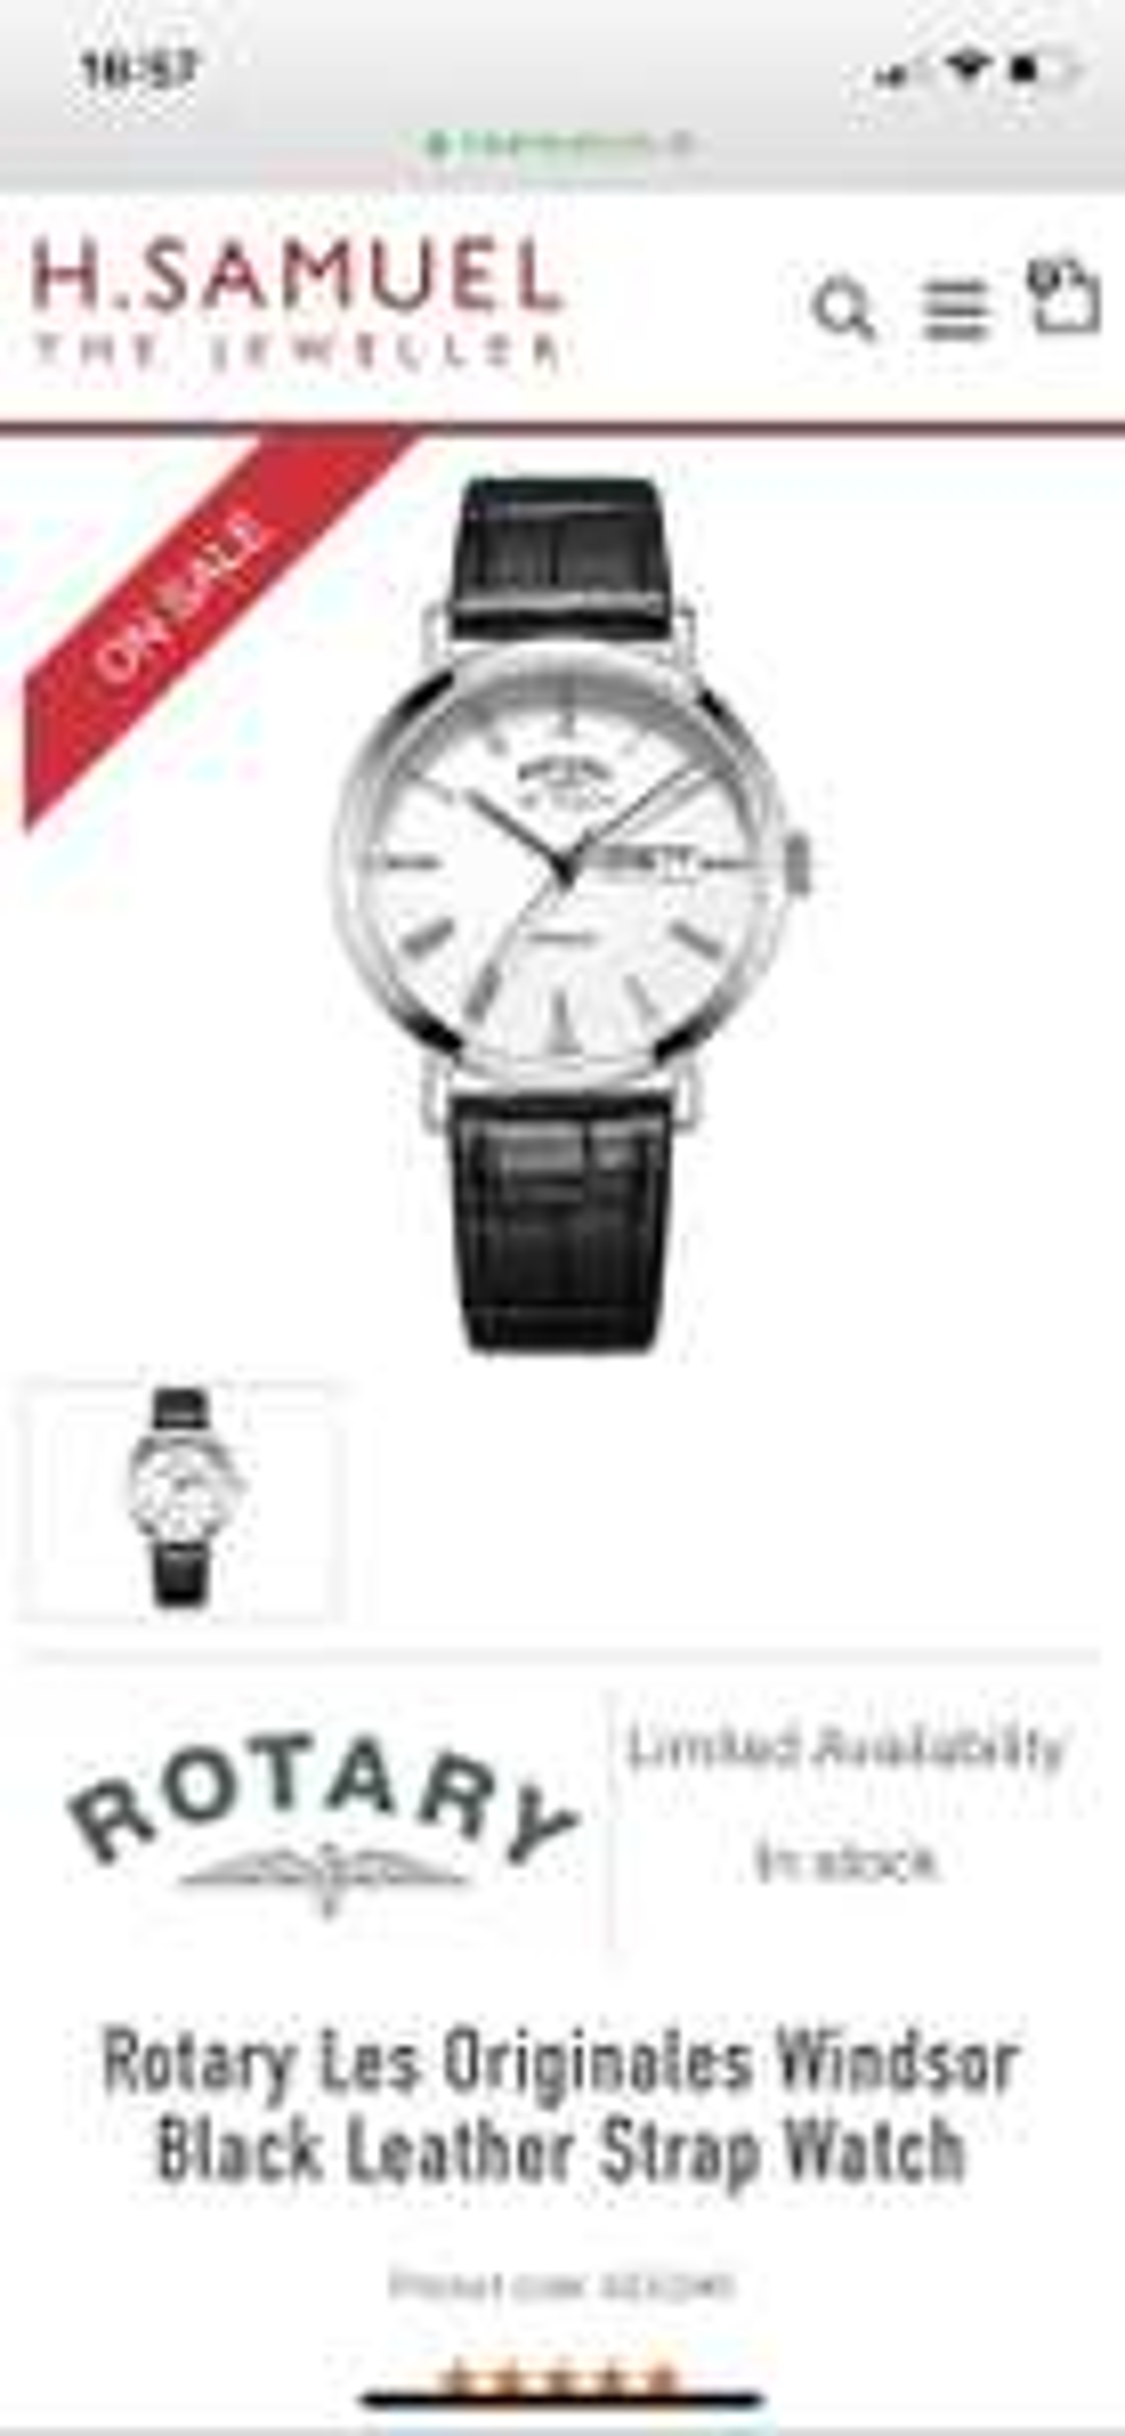 Rotary Windsor Swiss Made Watch - £53.99 @ H Samuel